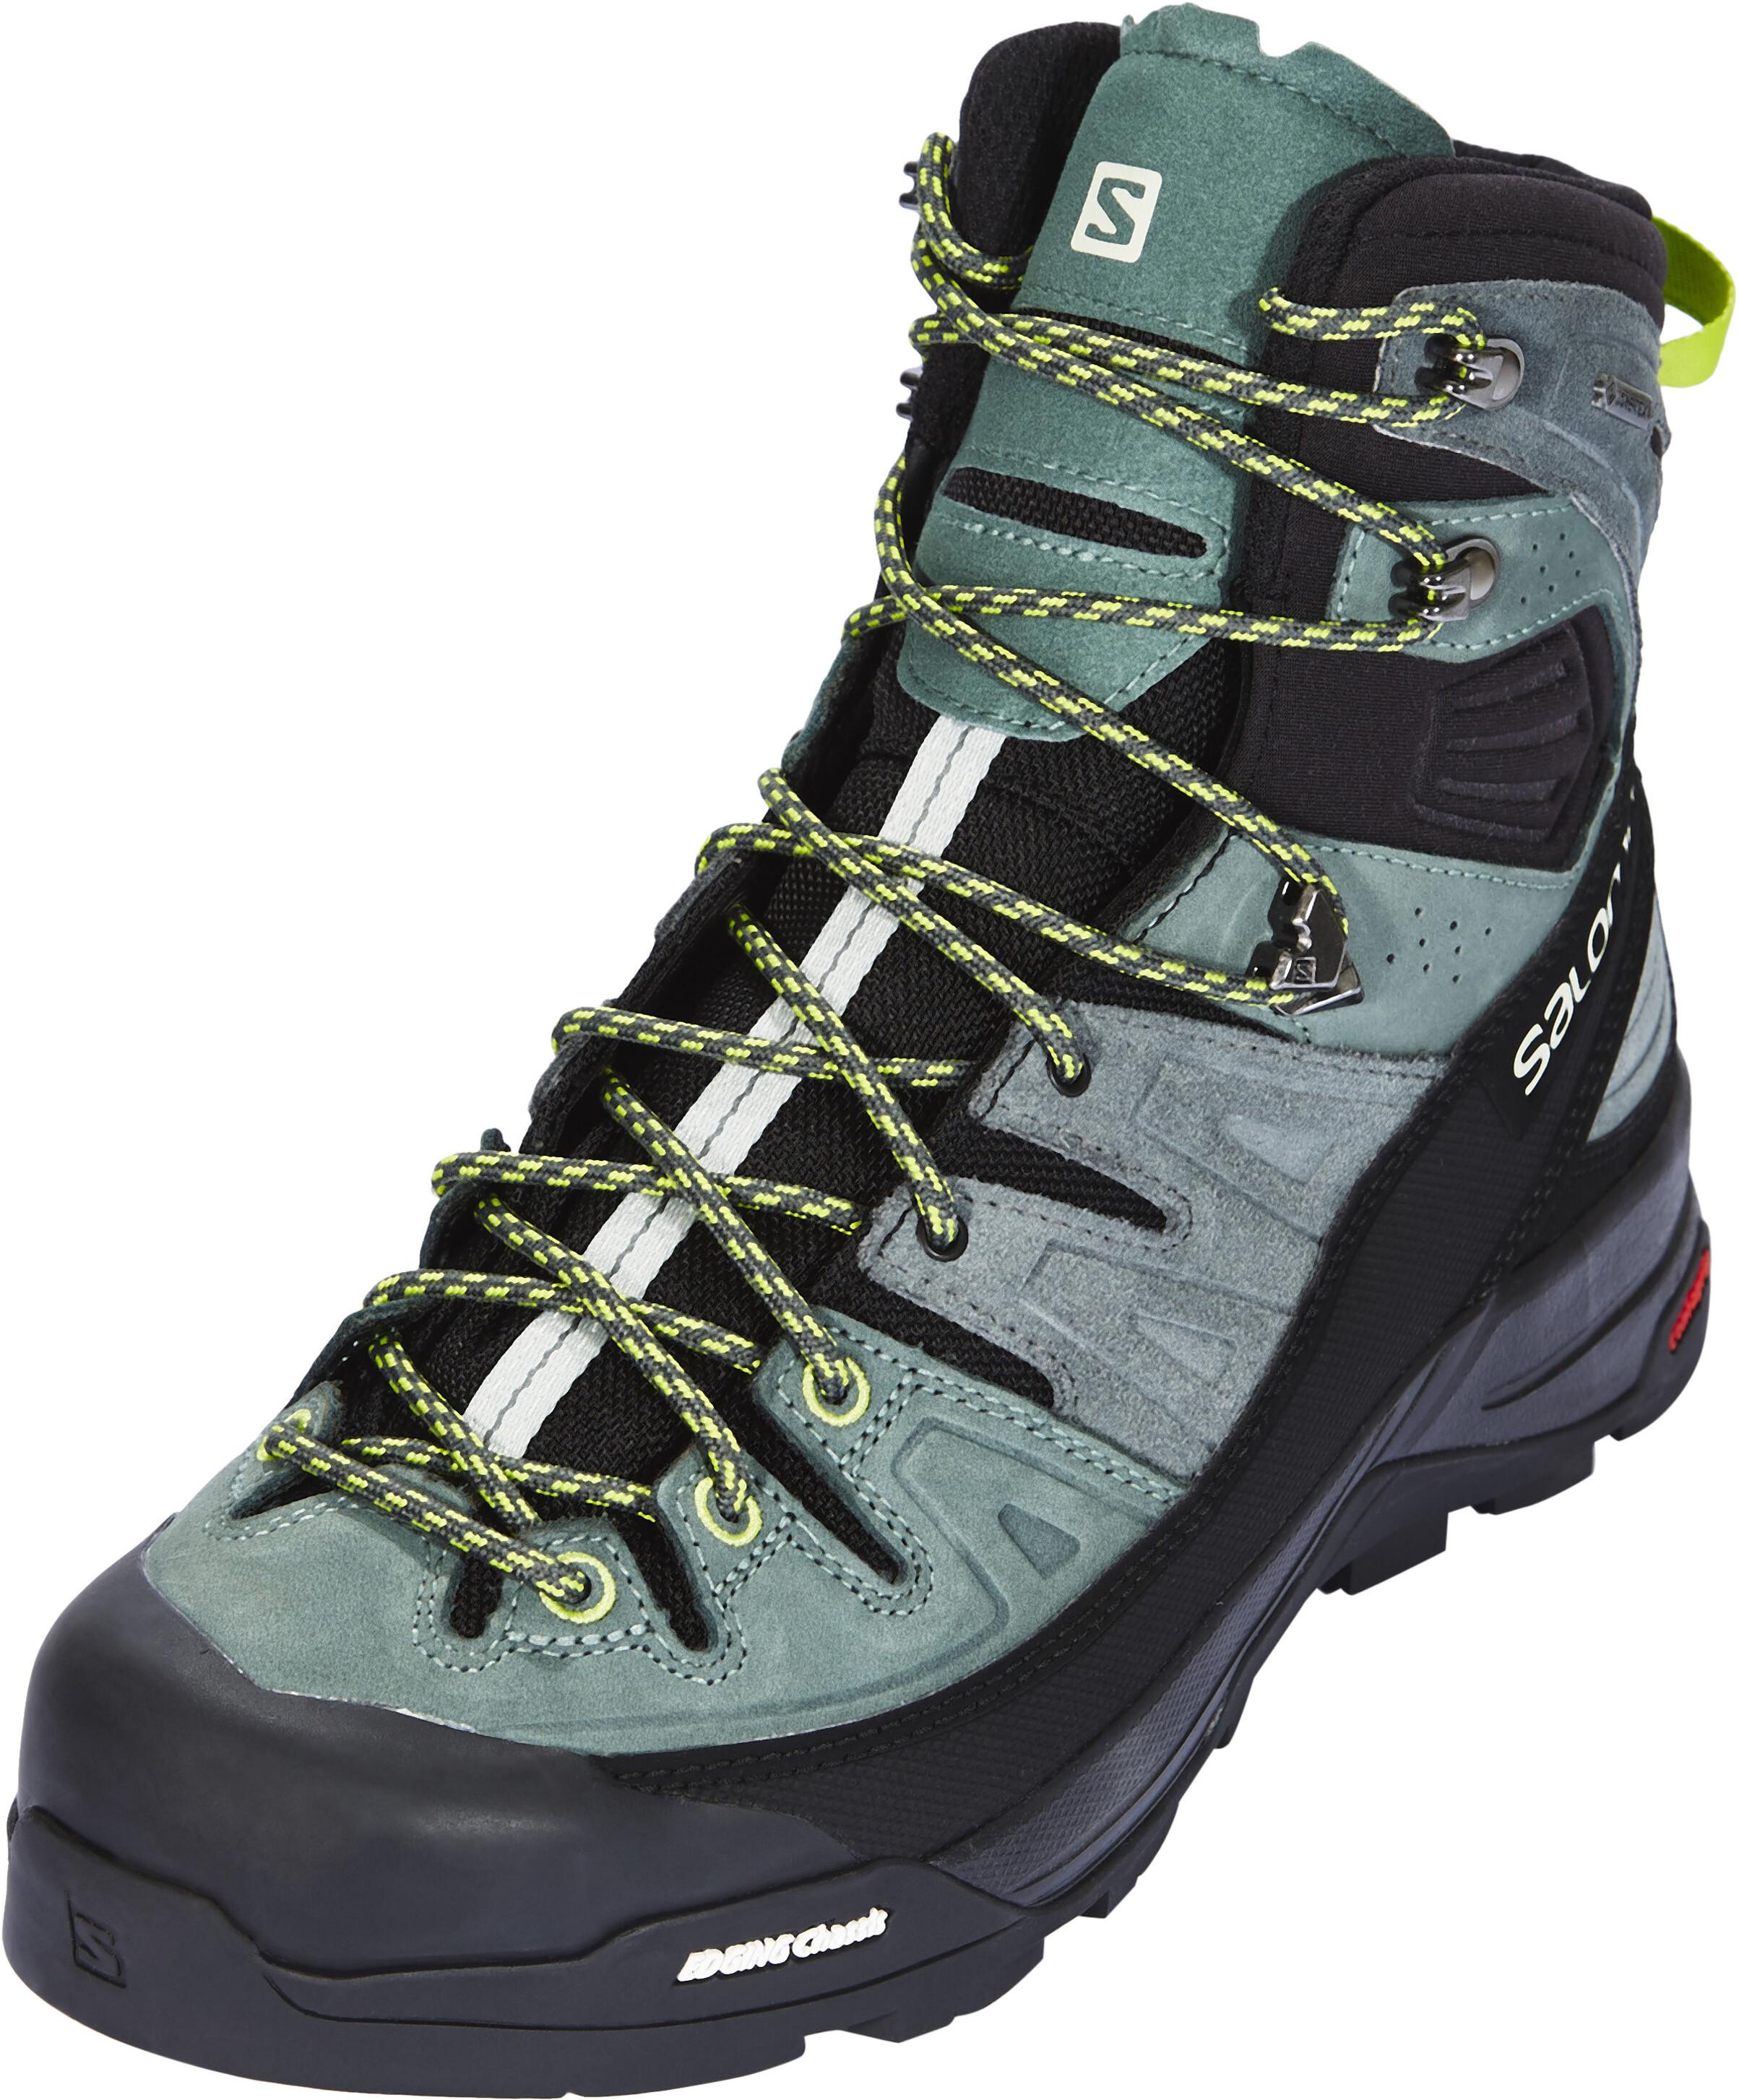 08e57fed2b0b Salomon X Alp High LTR GTX Shoes Men green at Addnature.co.uk